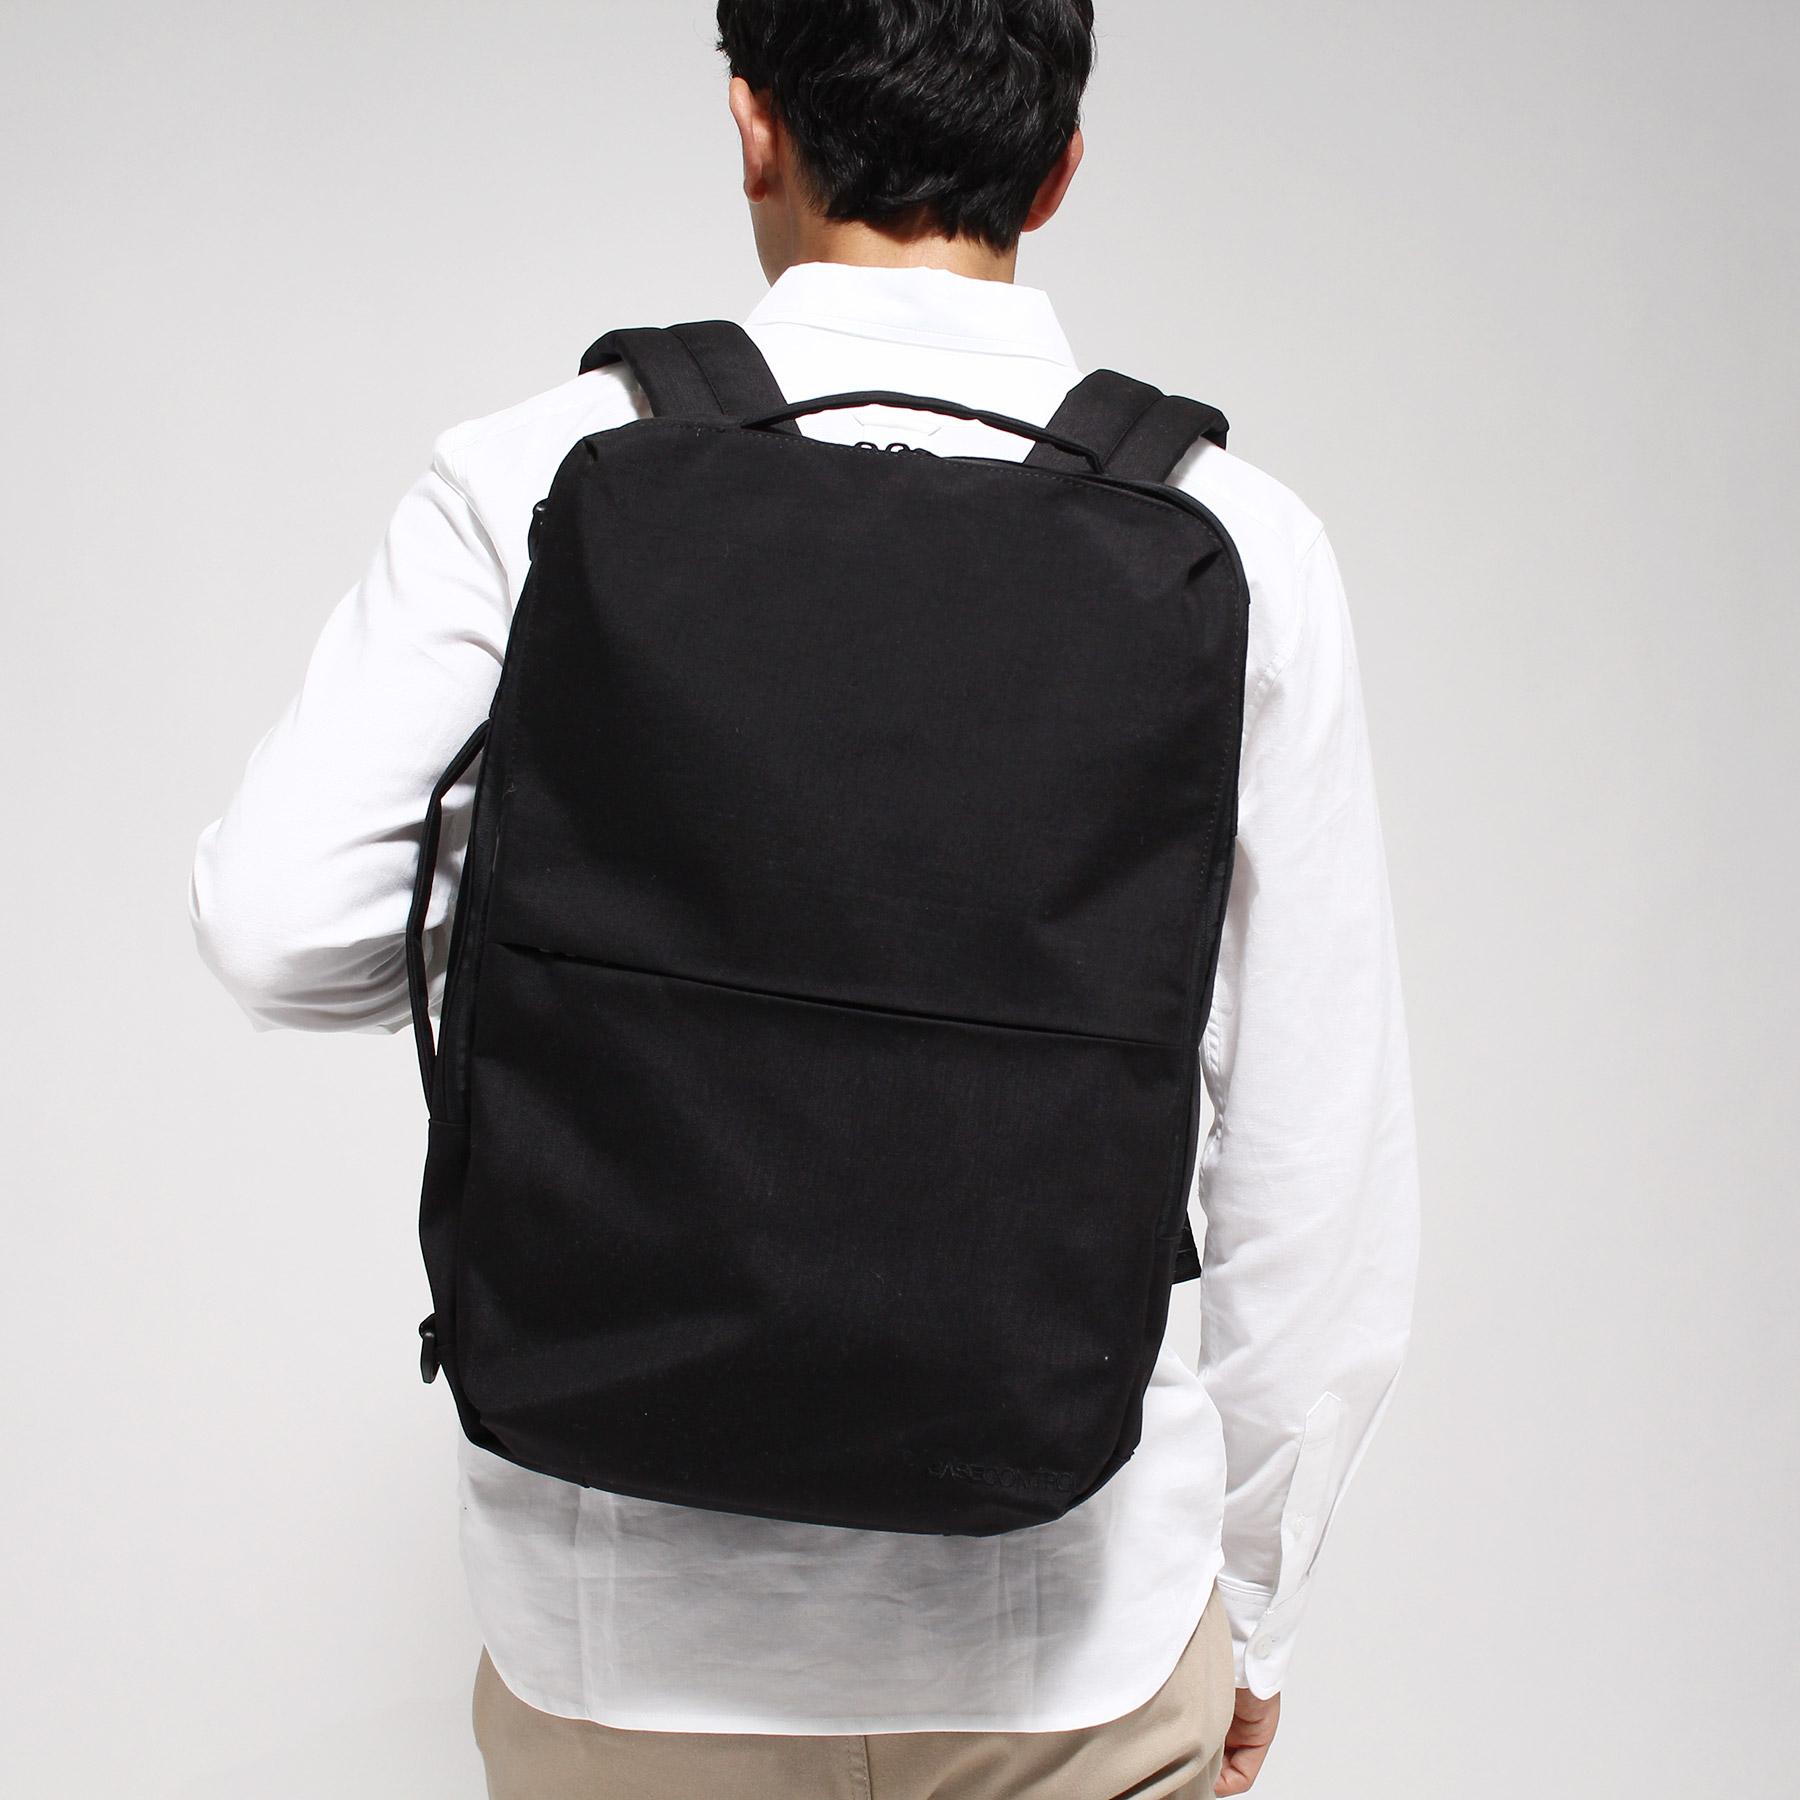 【BASECONTROL (ベース コントロール)】3WAYバックパック コーデュラ・ヘザー スミスメンズ バッグ|バックパック・リュック ブラック